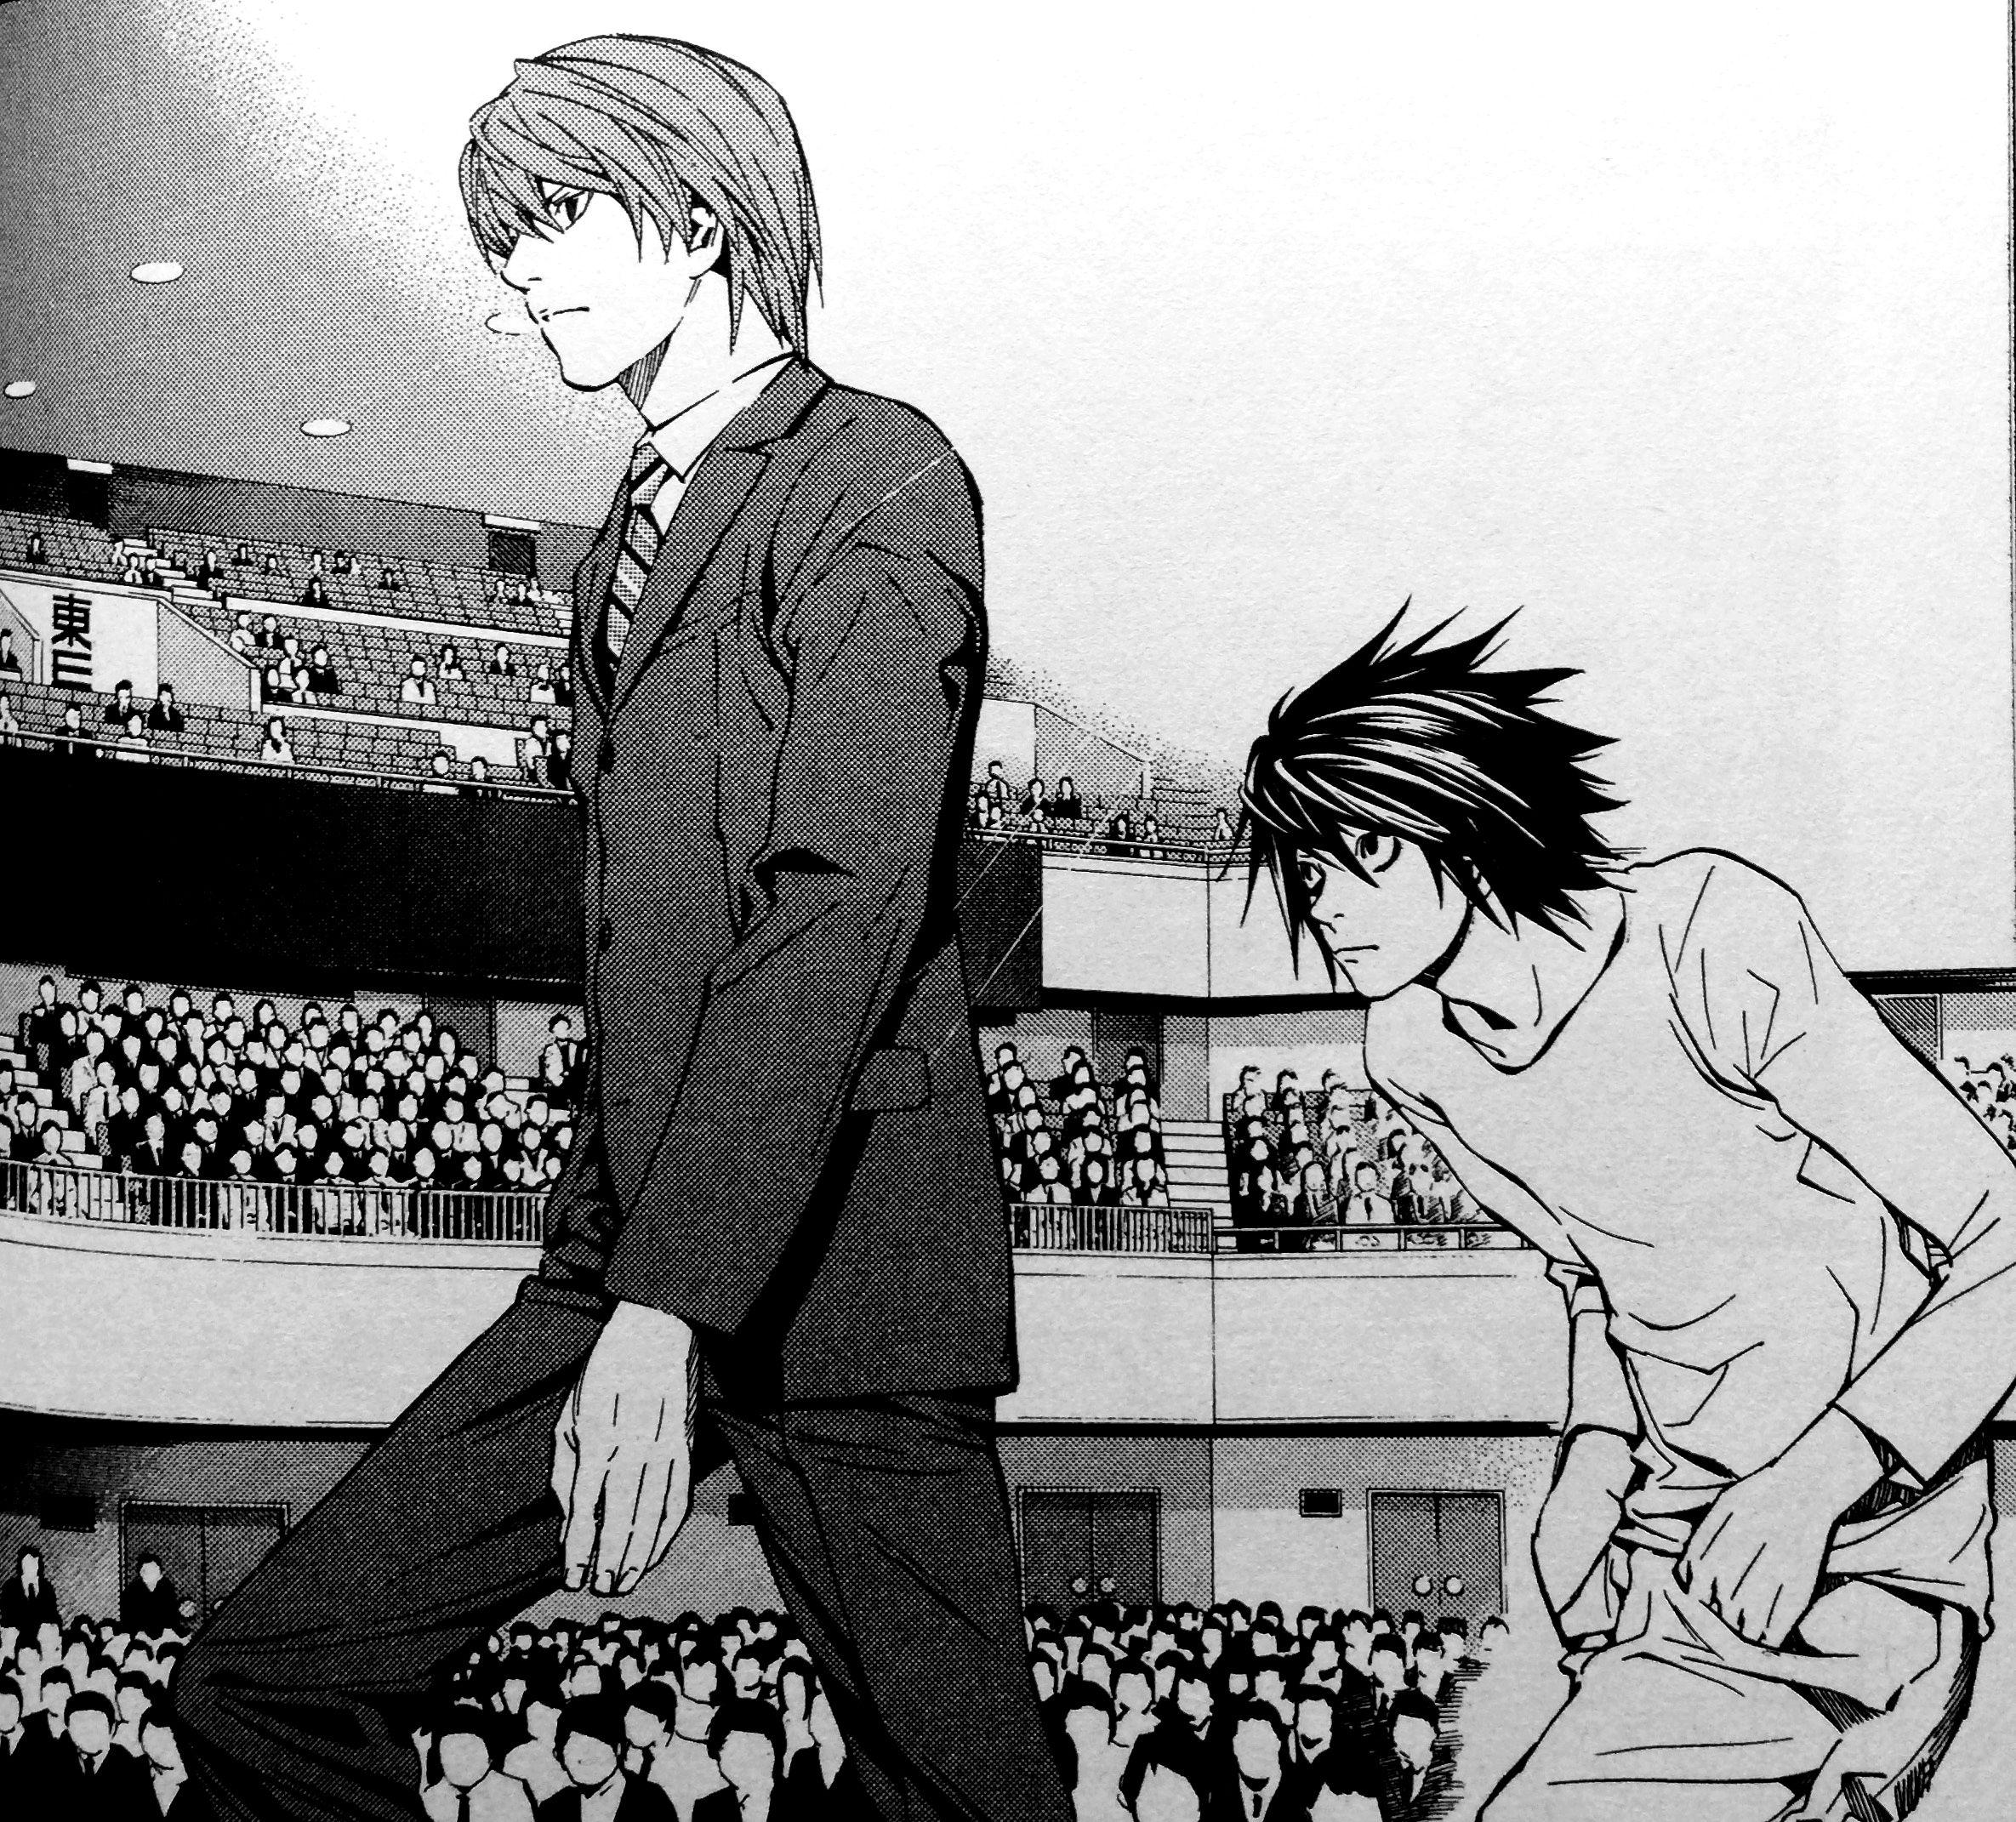 Death note manga tsugumi ohba and takeshi obata - Manga death note ...